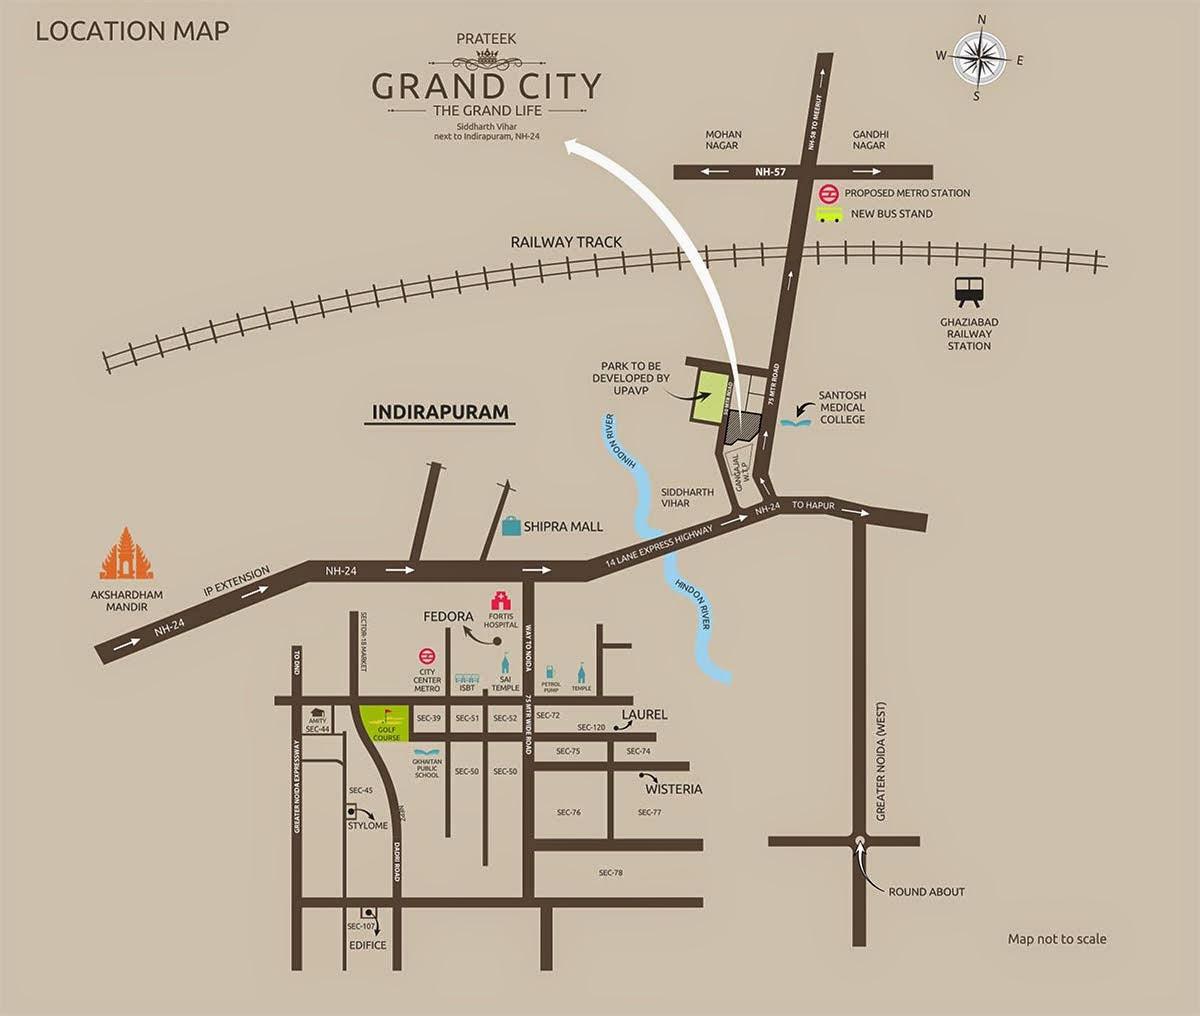 Prateek-Gran-City-location-map